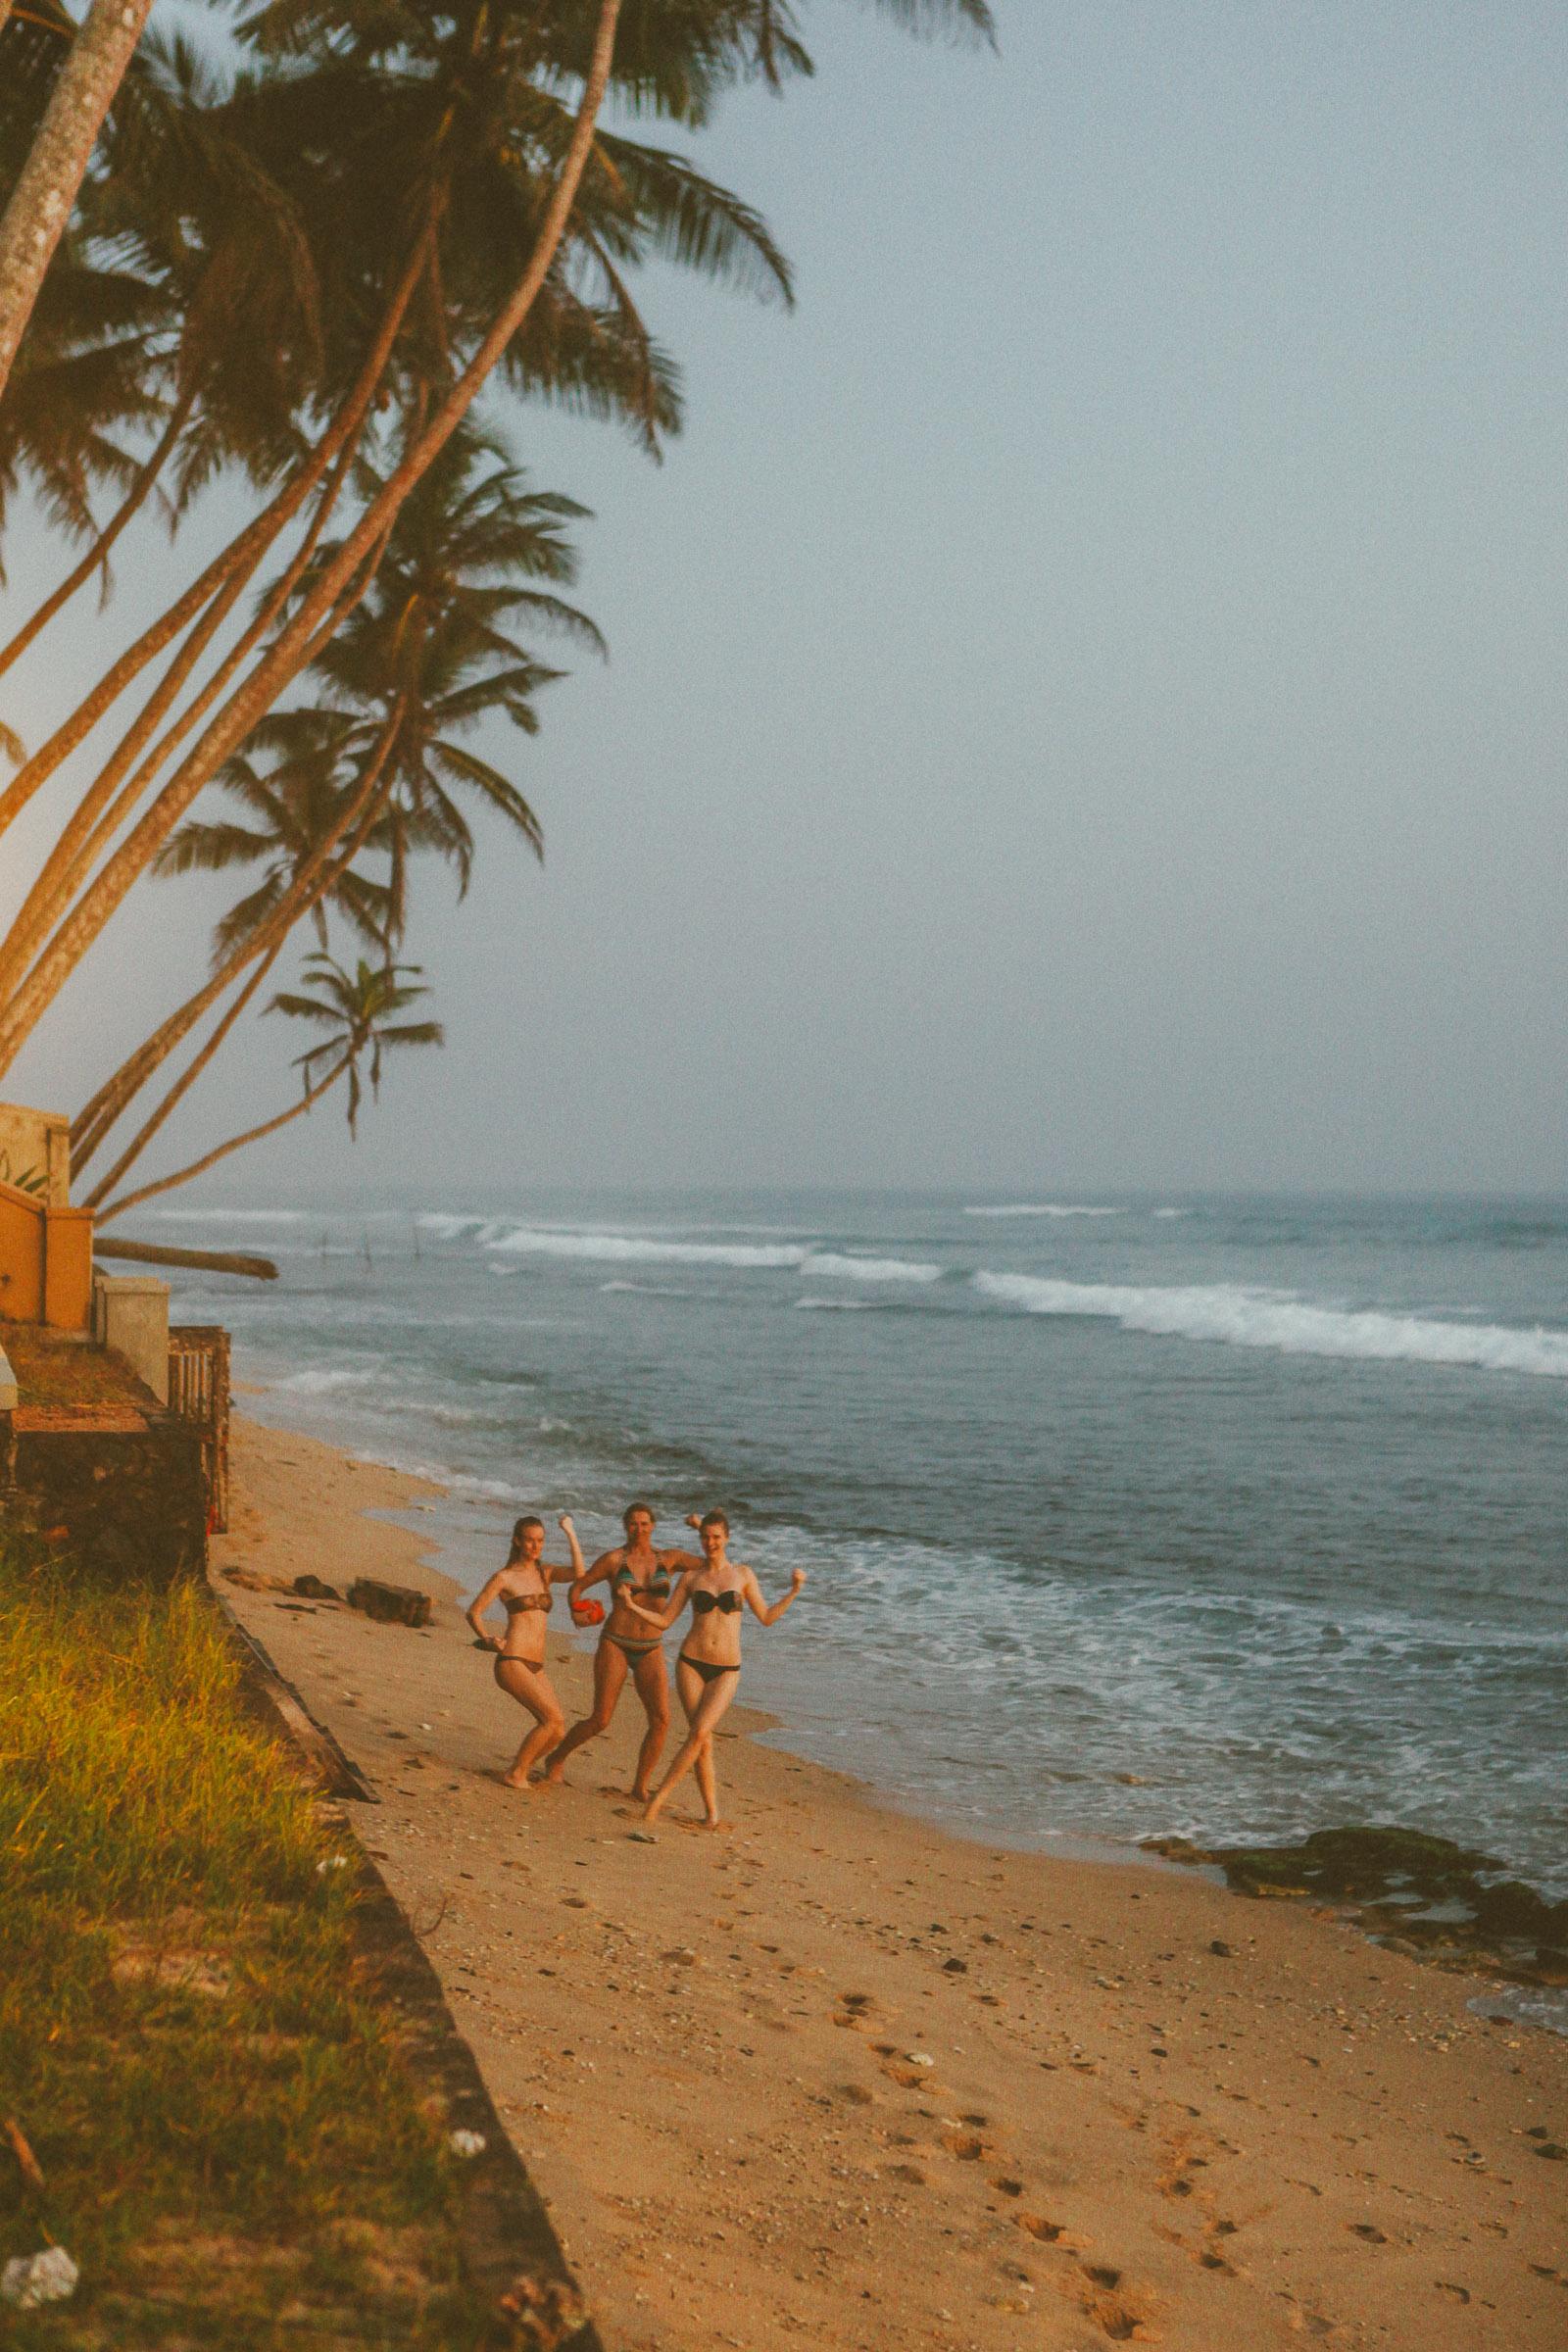 Sri Lanka-Hikkaduwa-Midigama-thalpe-era-beach-jetwing-surf-travel-blog-IMG_8810